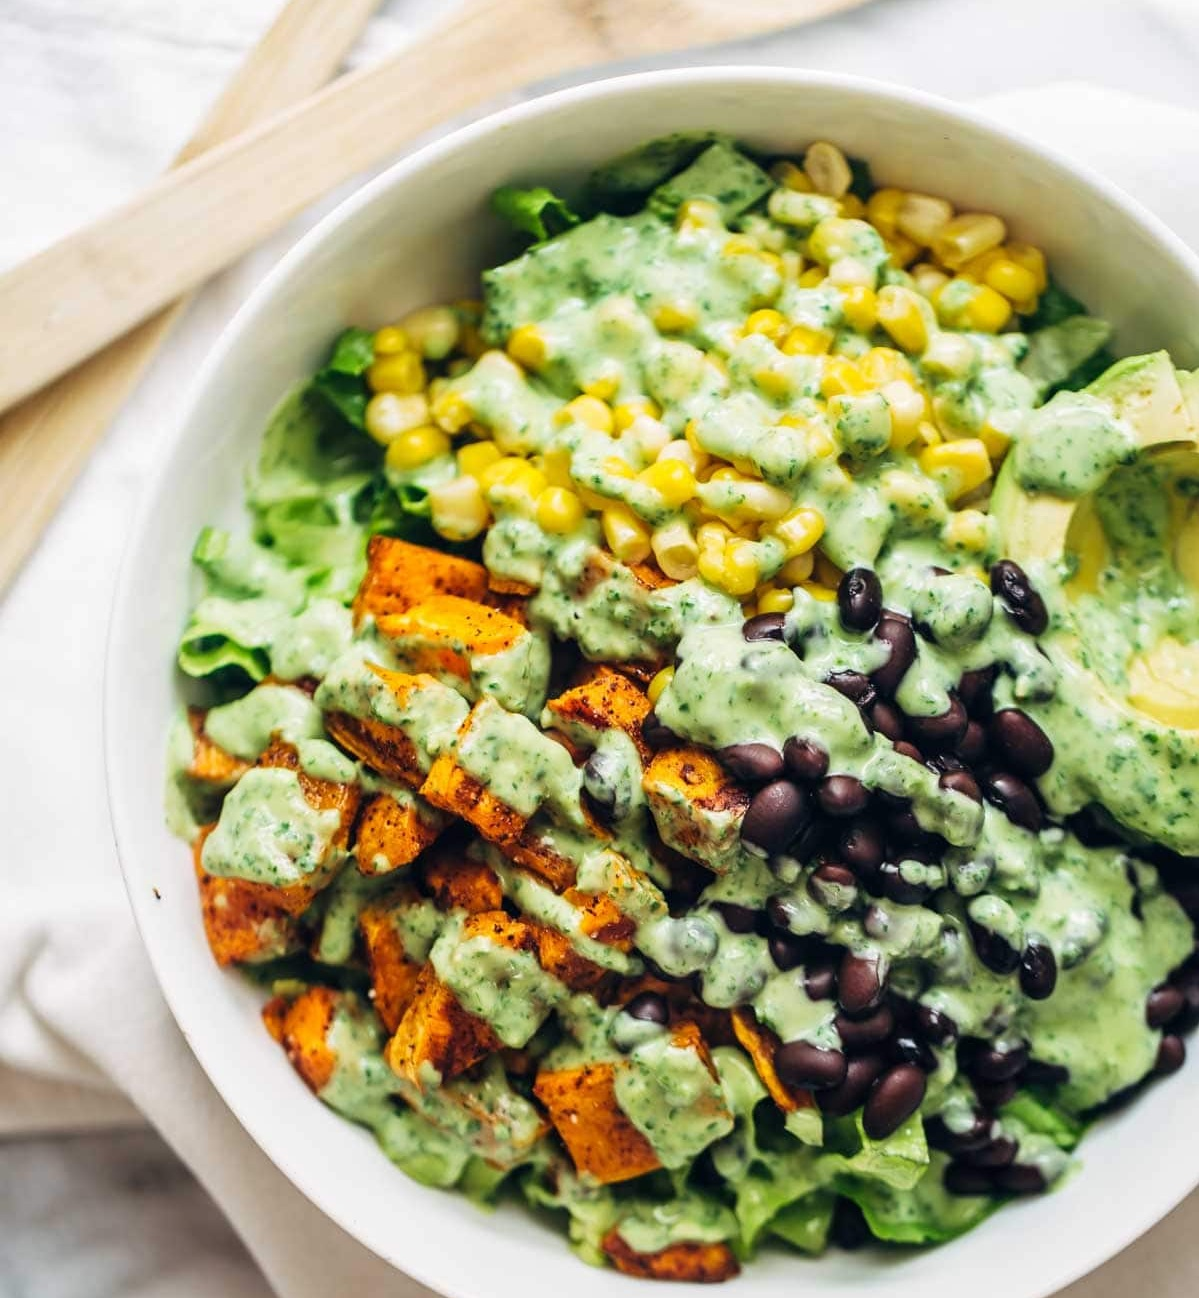 Southwestern Salad - 4 Servings